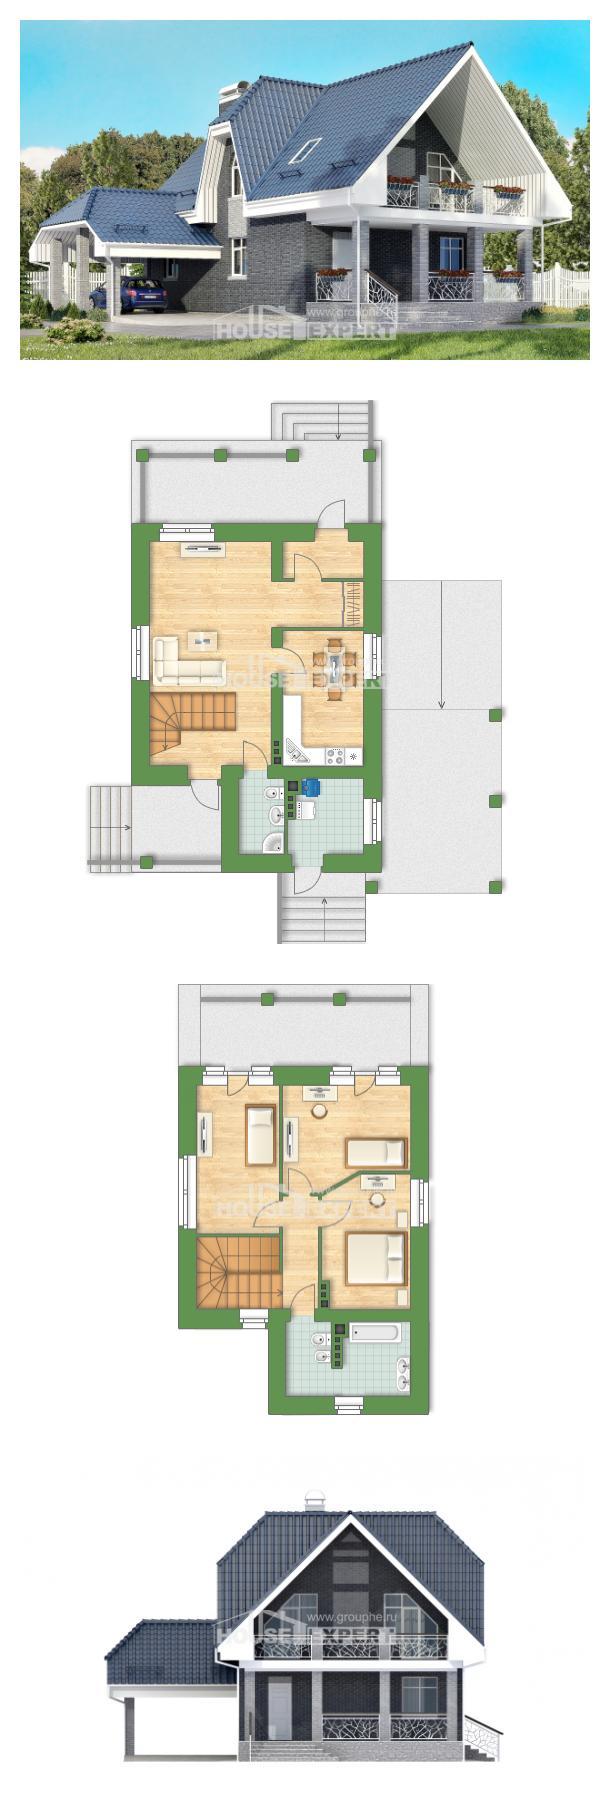 Проект дома 125-002-Л | House Expert